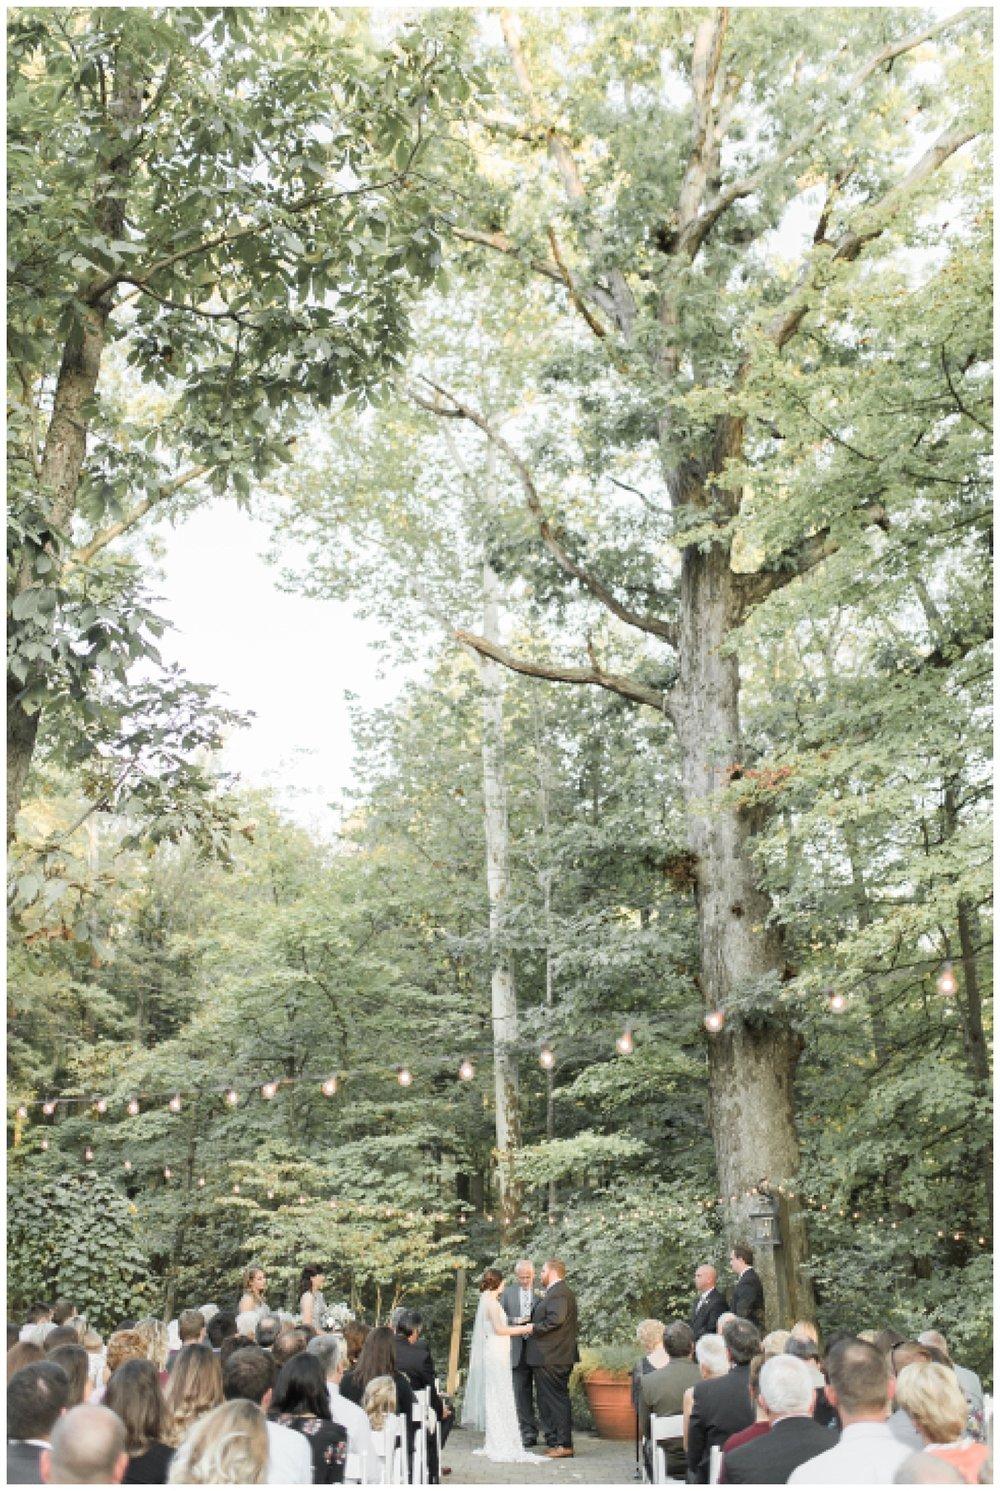 everleigh-photography-pyramid-hill-sculpture-park-cincinnati-wedding-photographer-the-faller-wedding-38